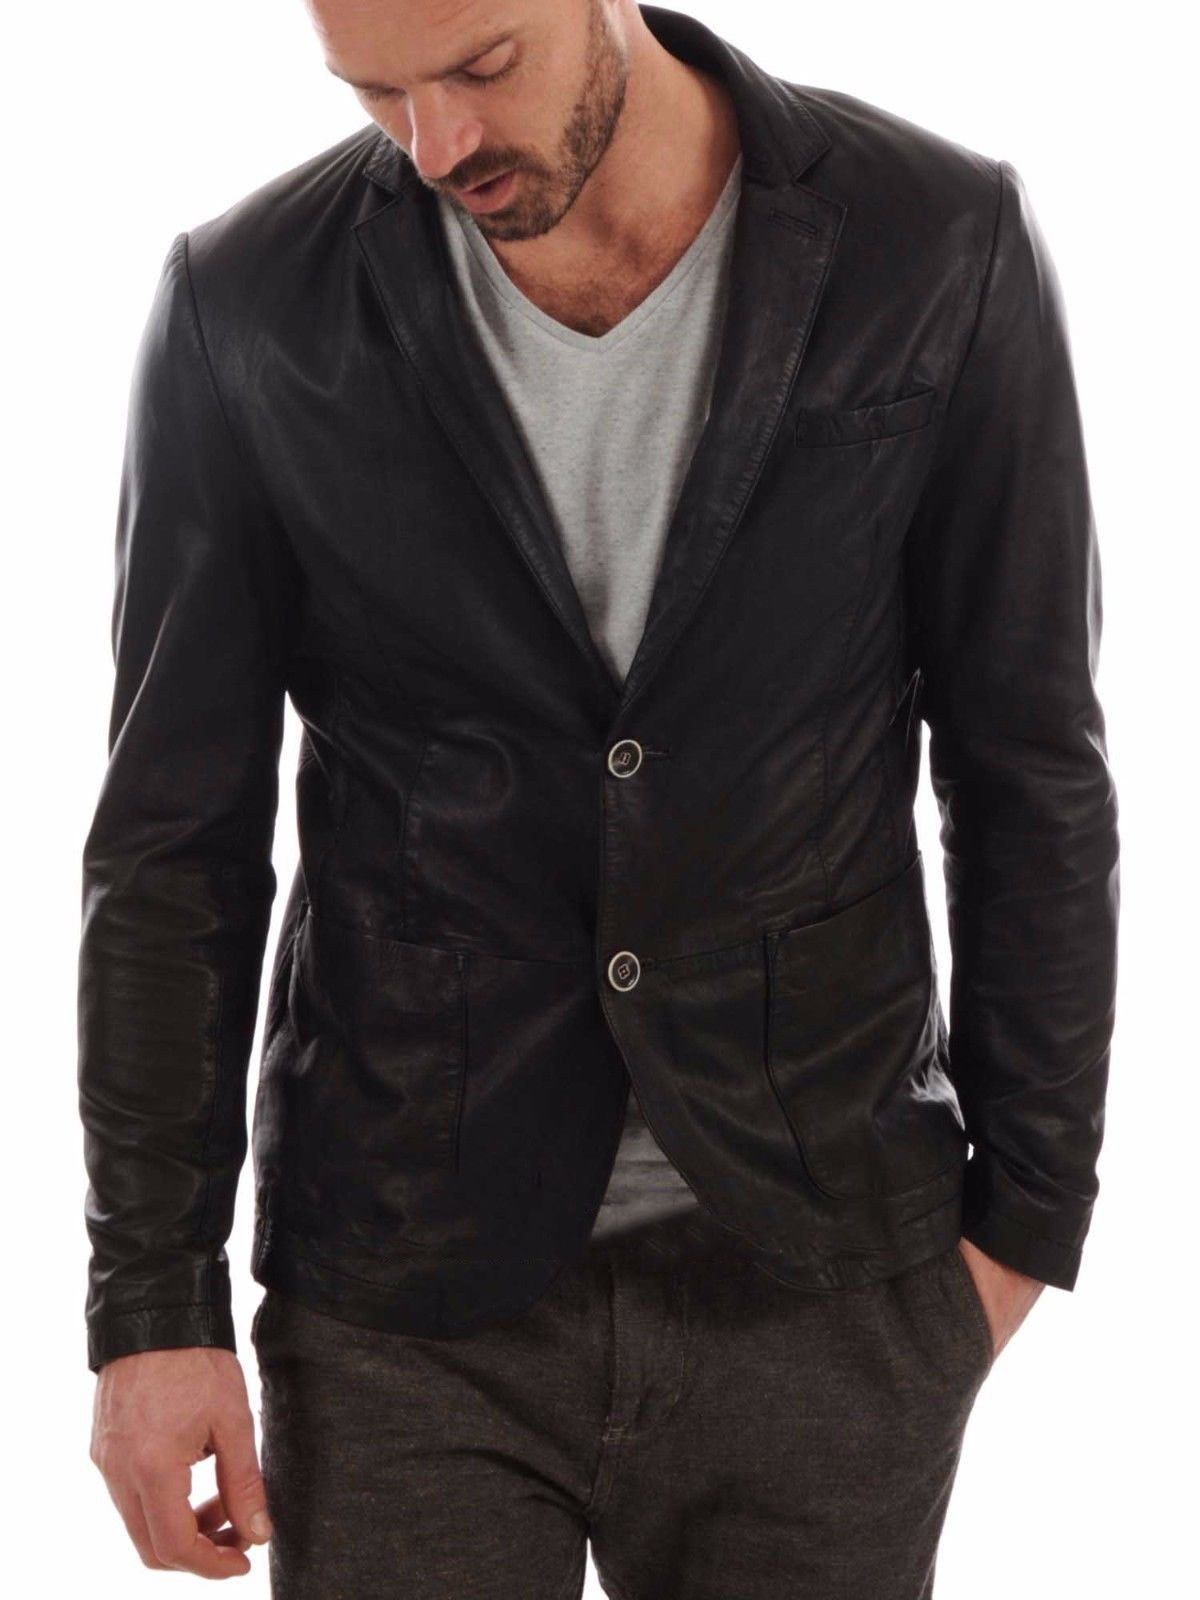 New Men's Genuine Lambskin Real Leather Blazer Jacket Slim Fit Coat Jacket - $119.99